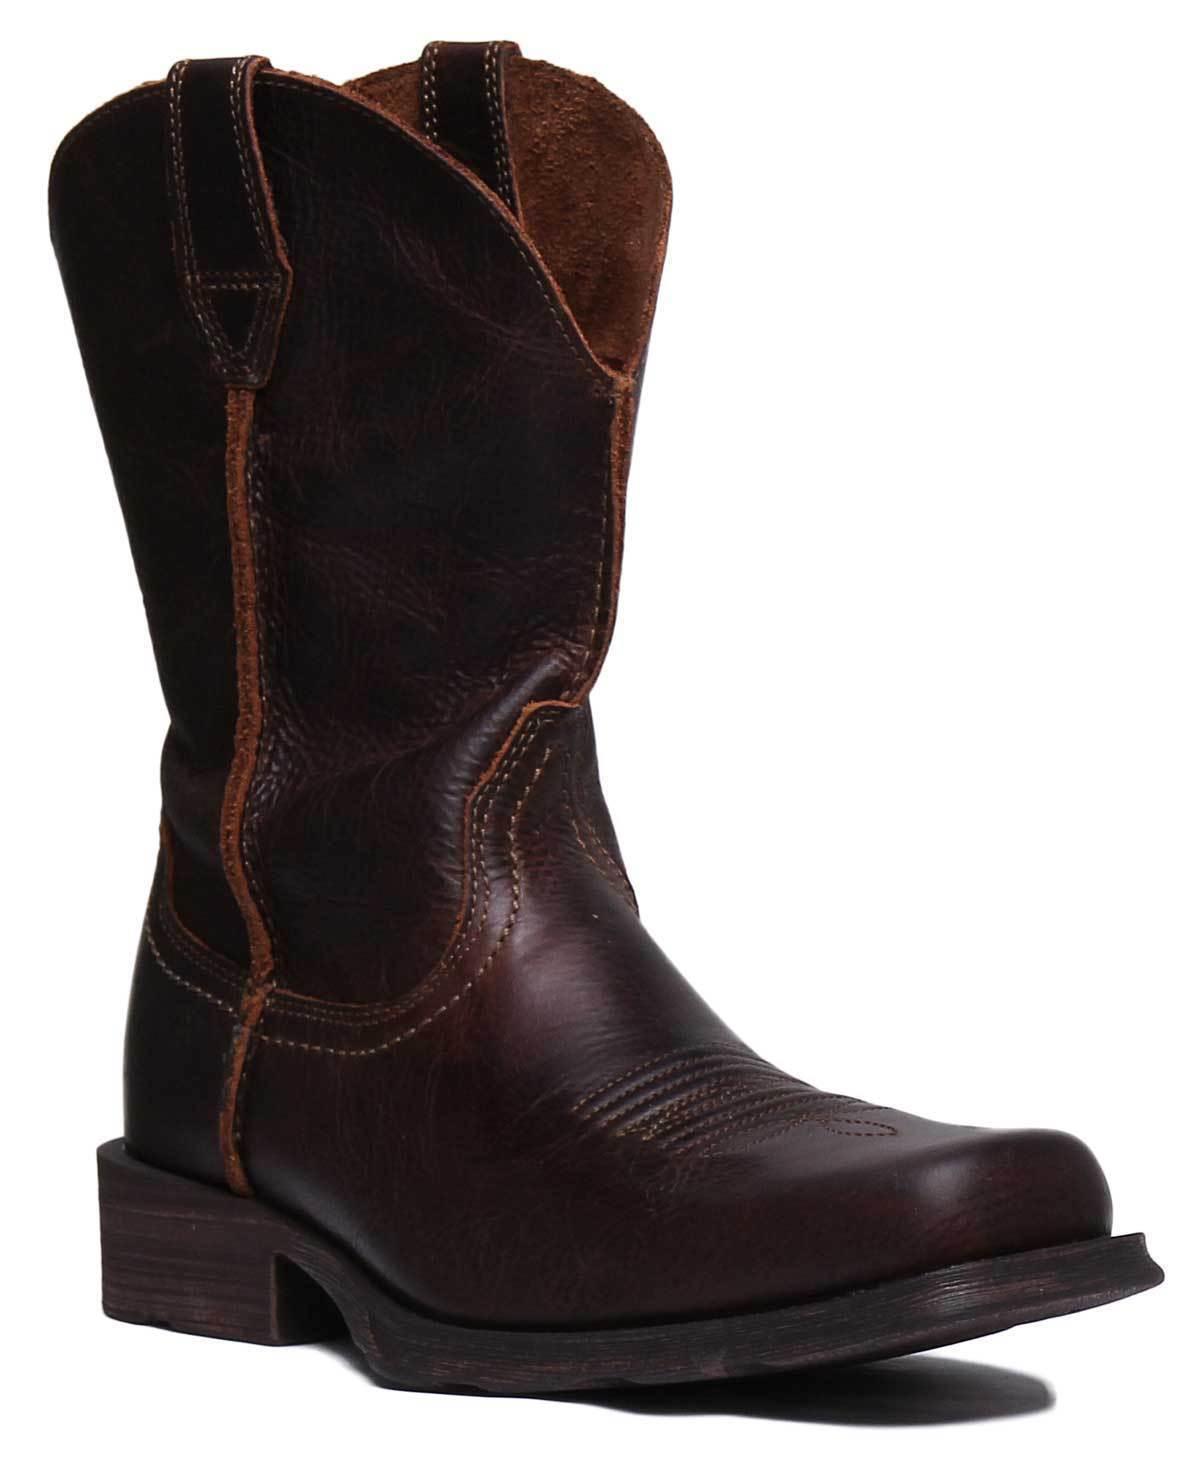 Ariat Rambler Men Leather Brown Knee High Western Boots UK Size 6 - 12